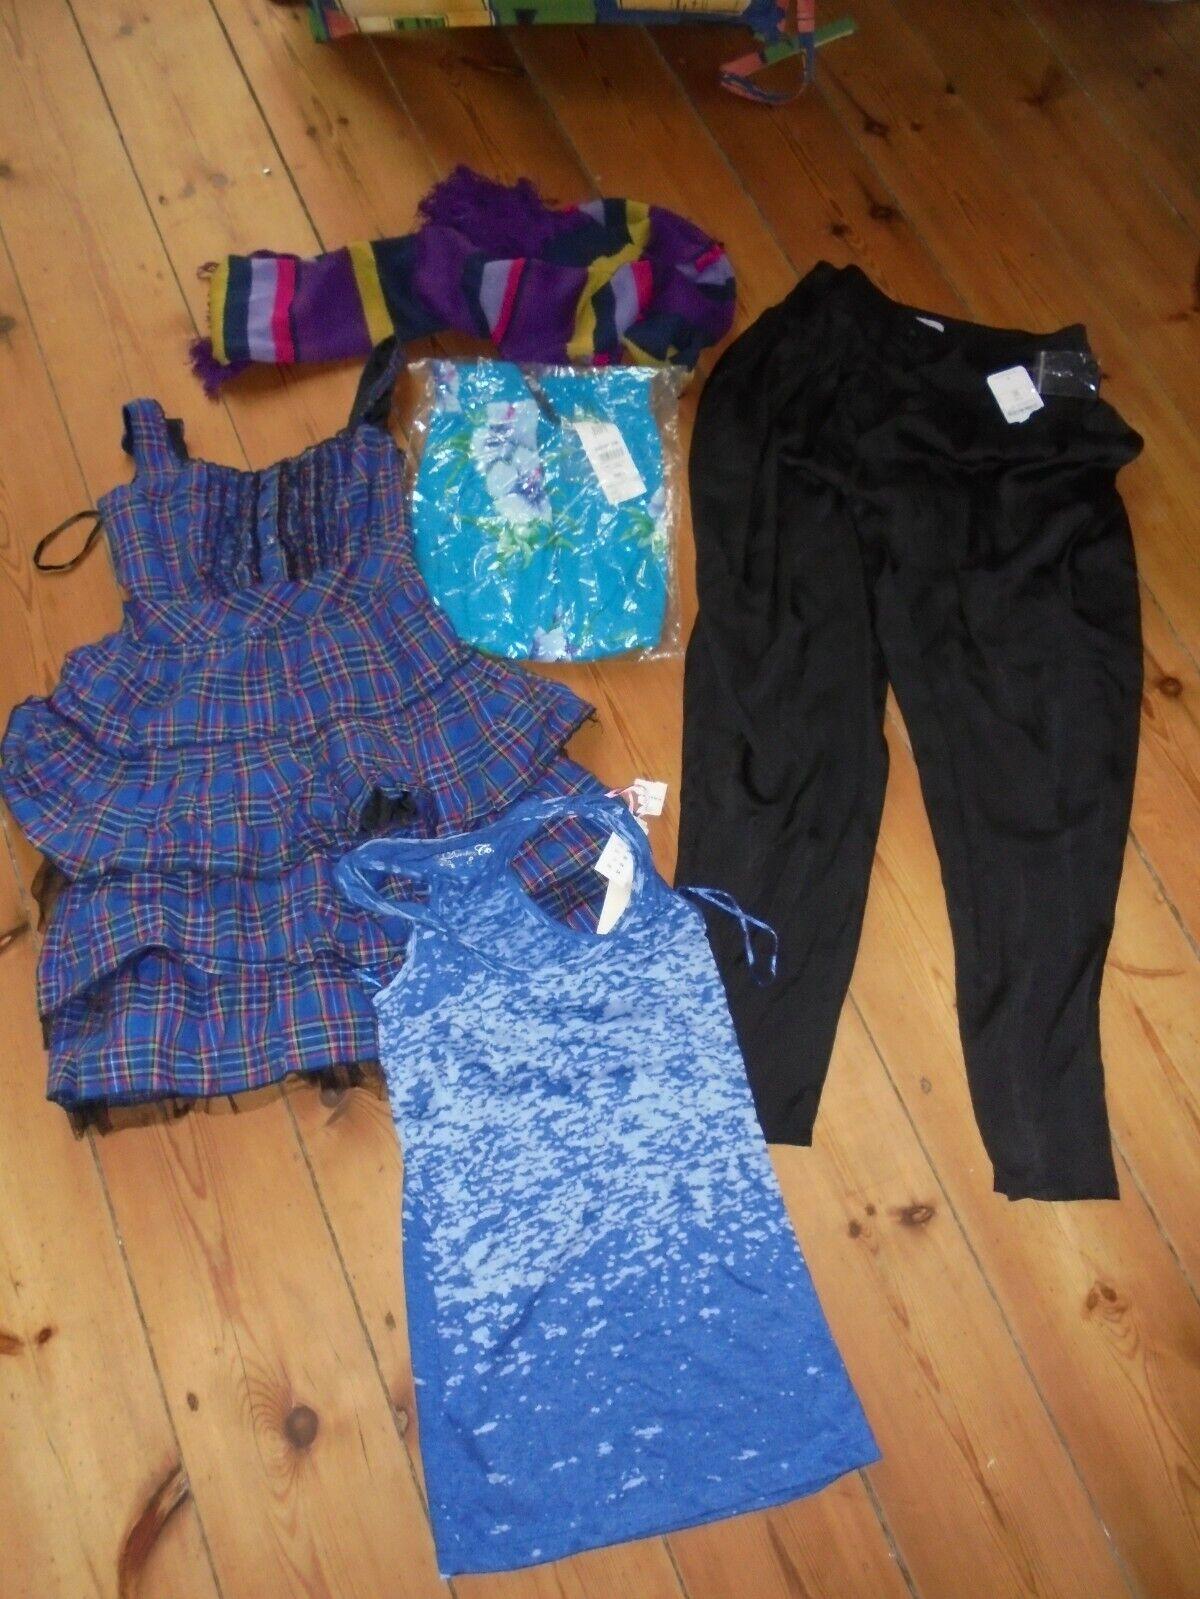 5x Kleid Harem Hose Batik Top Shirt Schal Set Gr 34 36 XS 8 Primark Avanti NEU